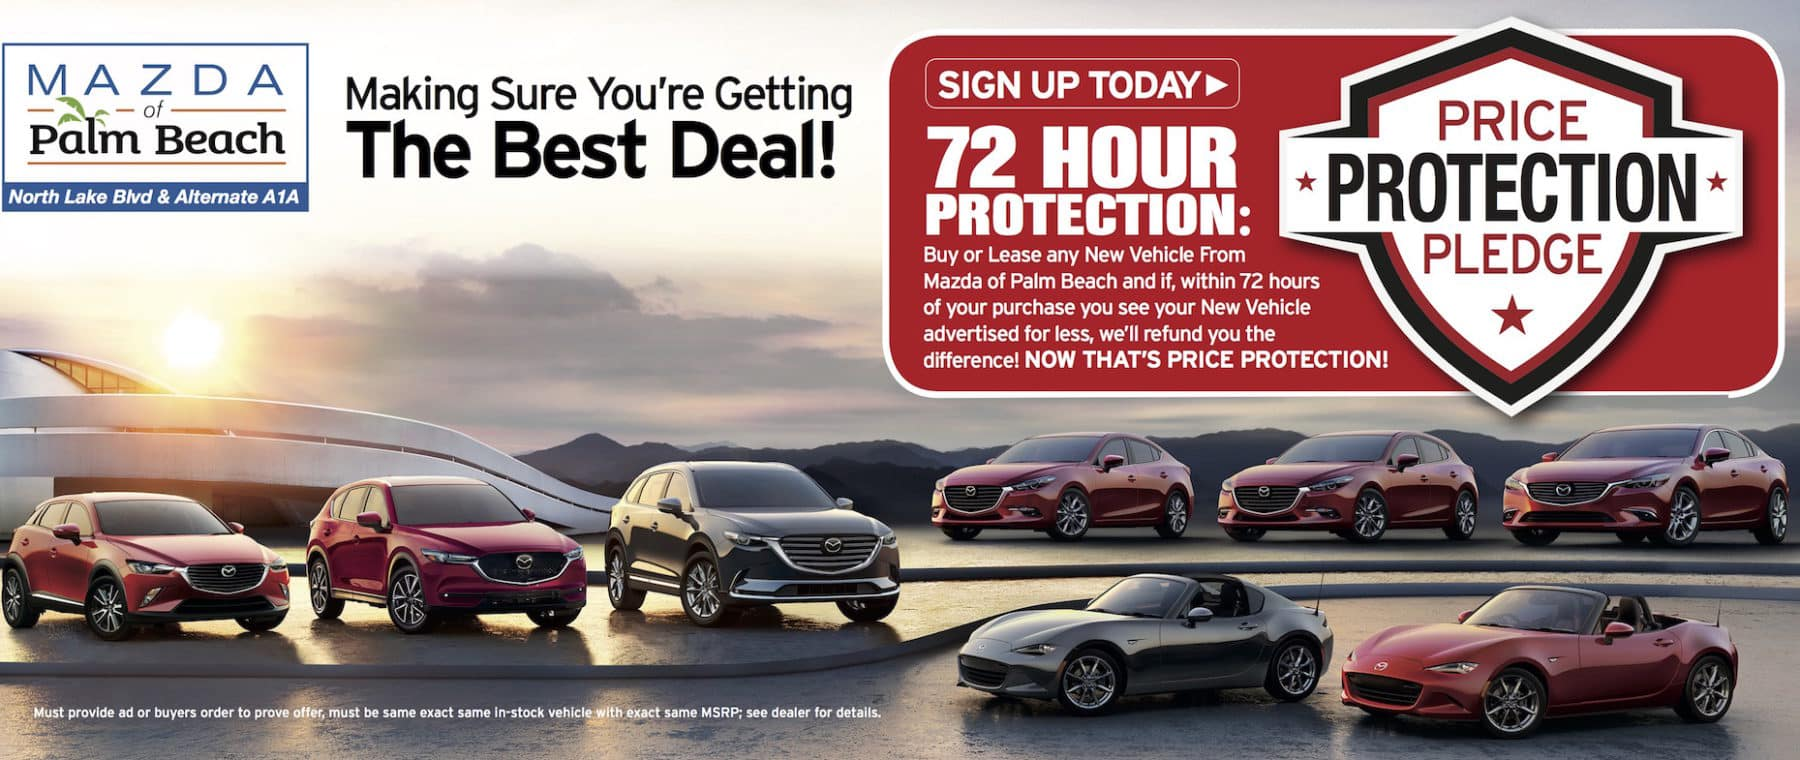 Mazda Pledge